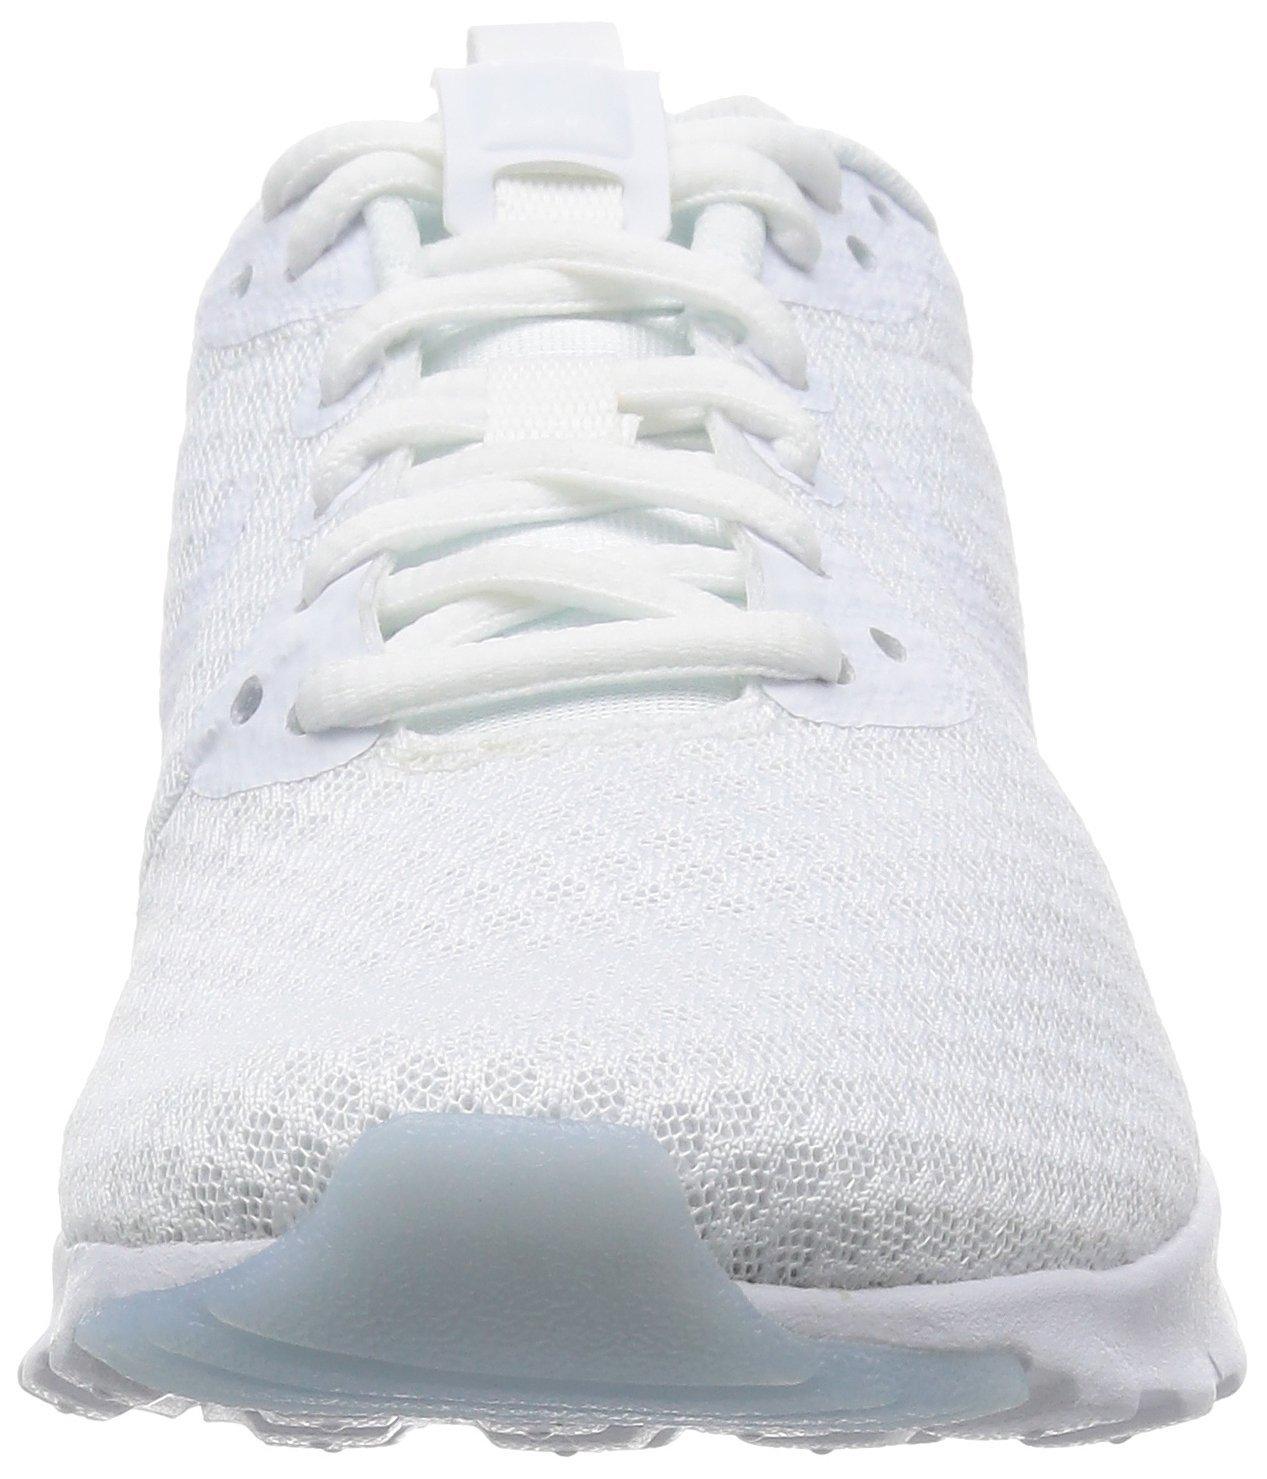 NIKE Women's Air Max Motion LW Running Shoe, White/White, 8.5 M US by NIKE (Image #4)